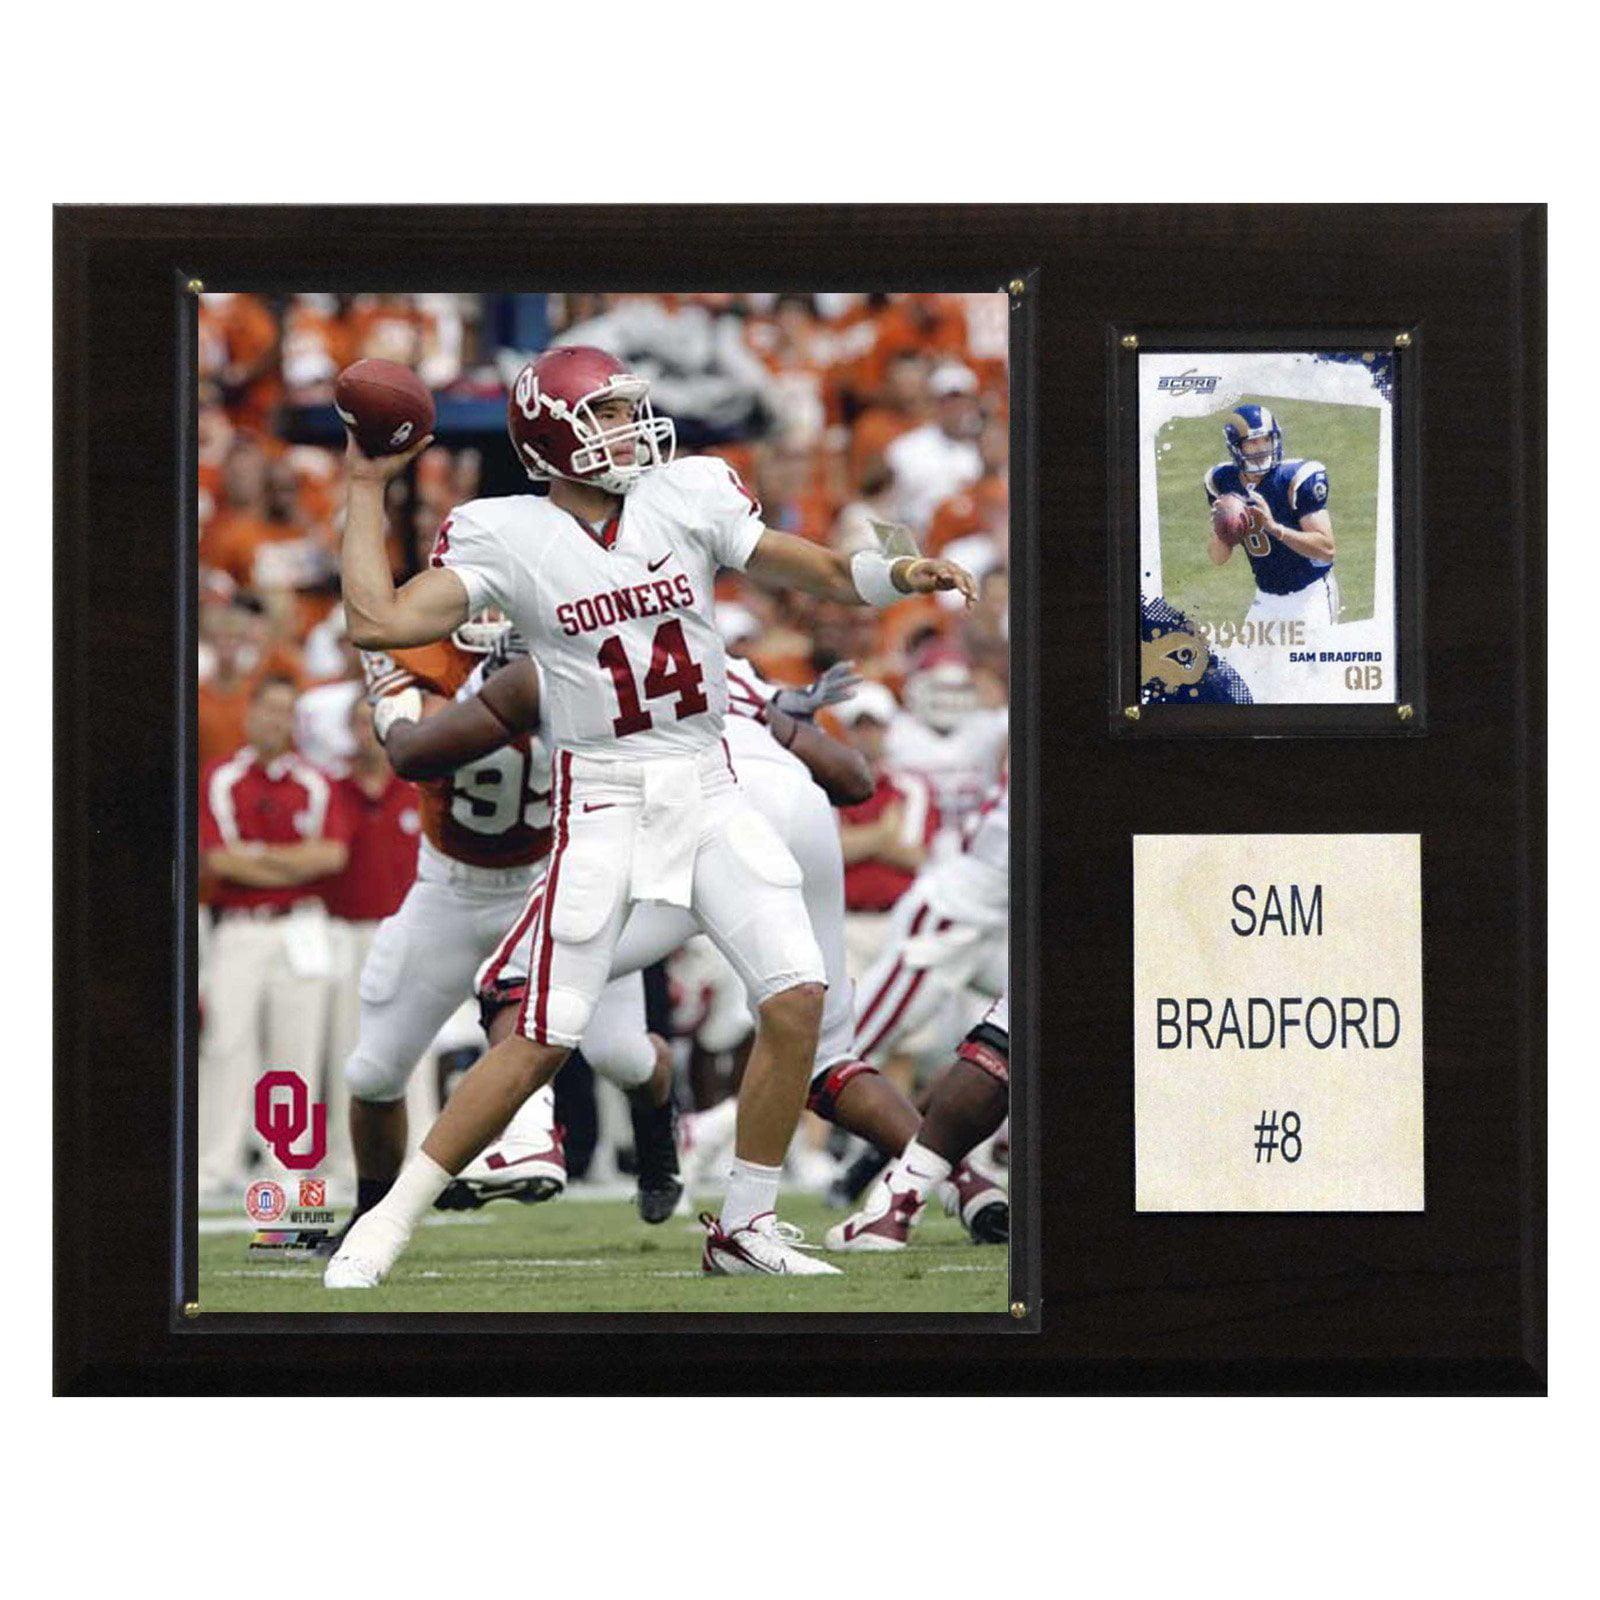 C&I Collectables NCAA Football 12x15 Sam Bradford Oklahoma Sooners Player Plaque